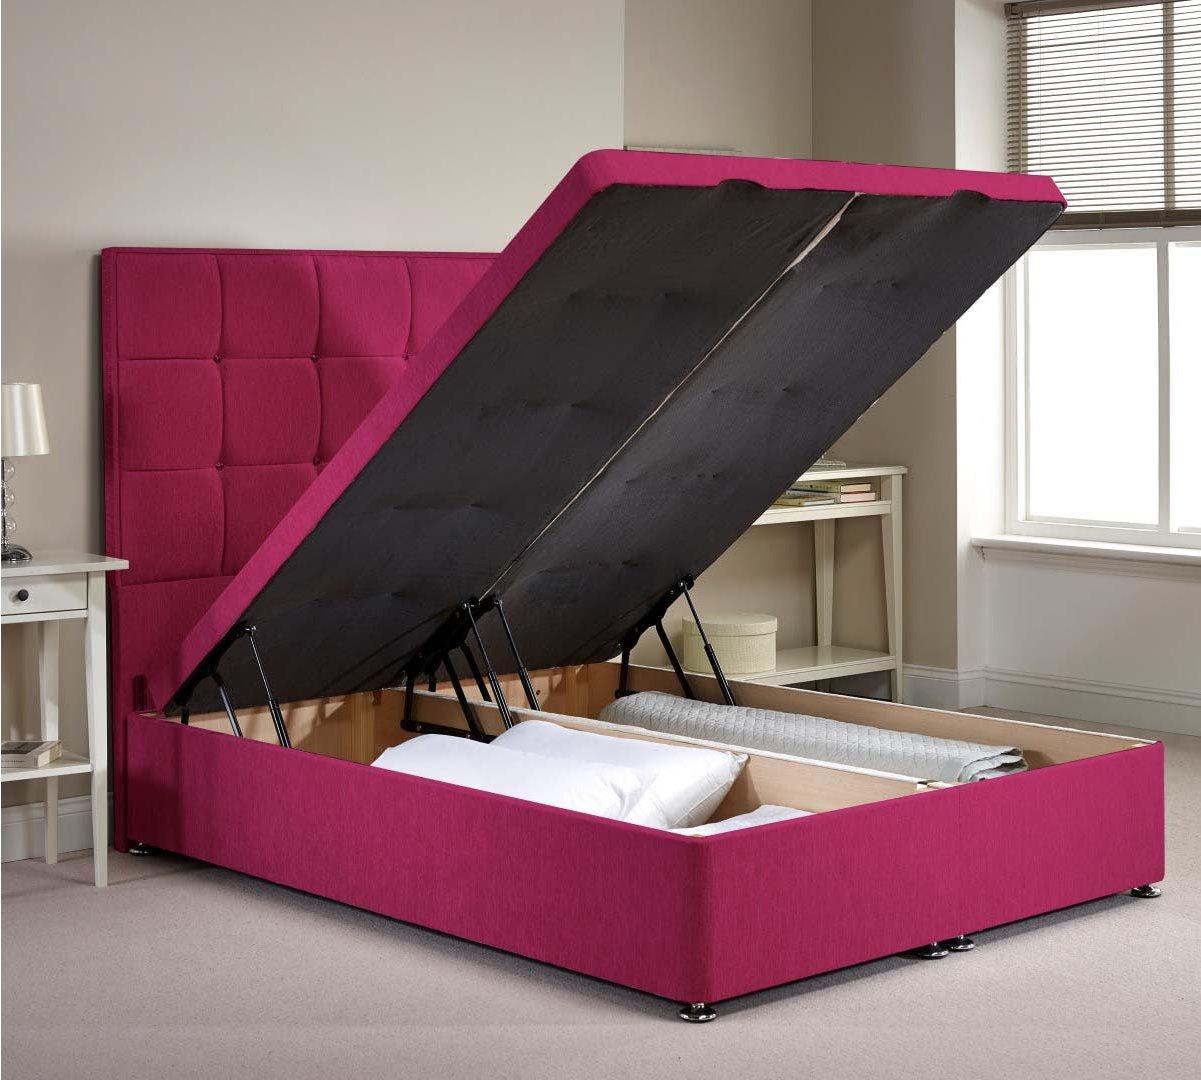 Luxan App Fra Pnk Chnl Nd 60 Beds